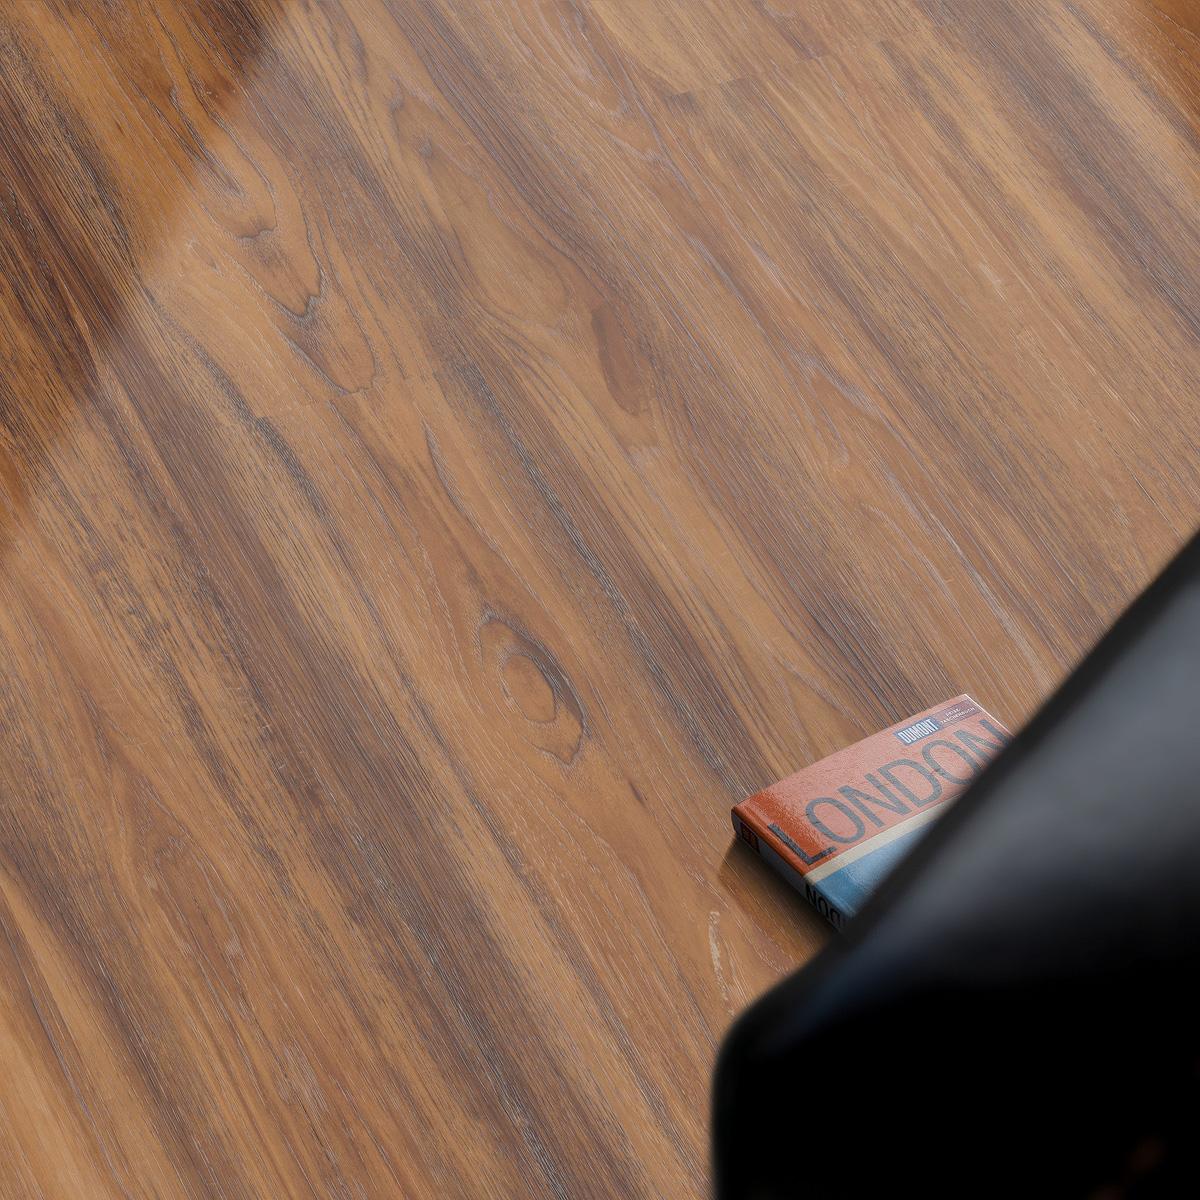 vinylboden vinfloor plank eiche old pub landhausdiele. Black Bedroom Furniture Sets. Home Design Ideas